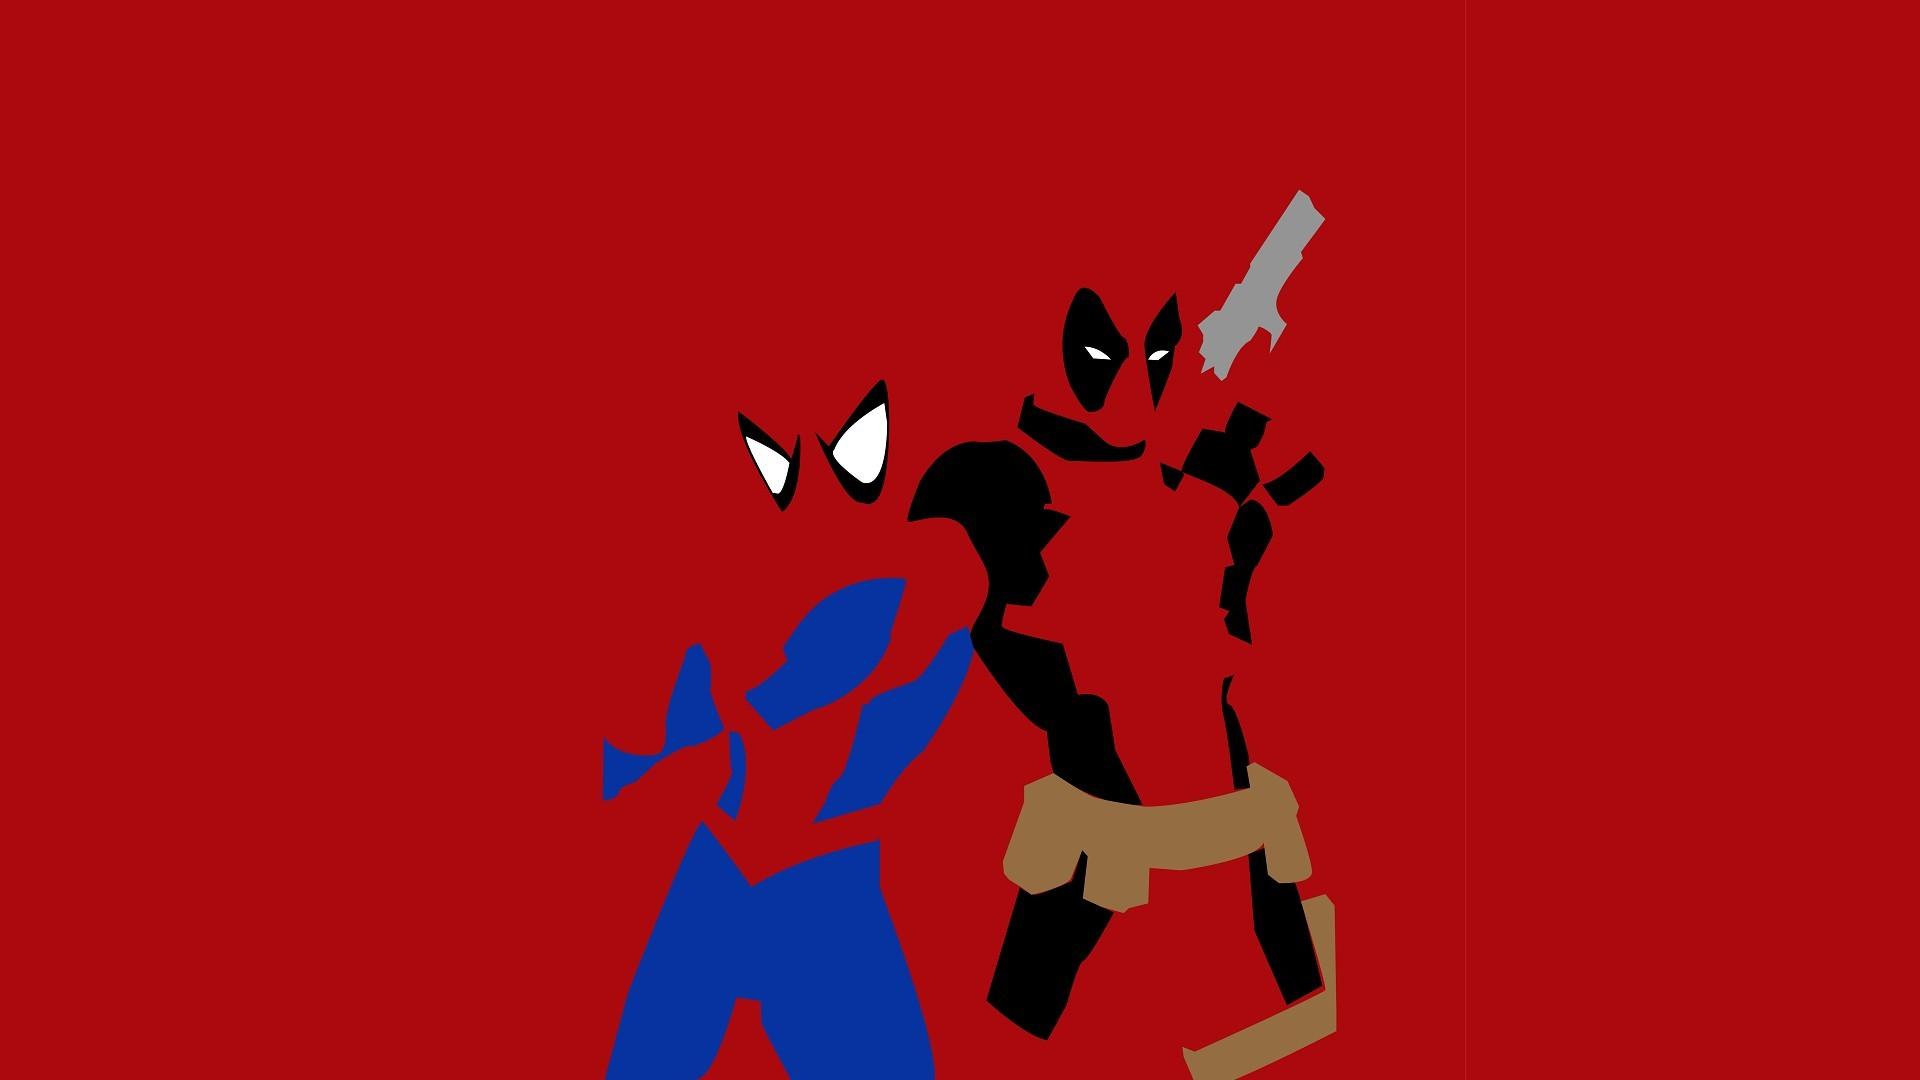 1920x1080 Spider Man Deadpool Wallpapers HD Free